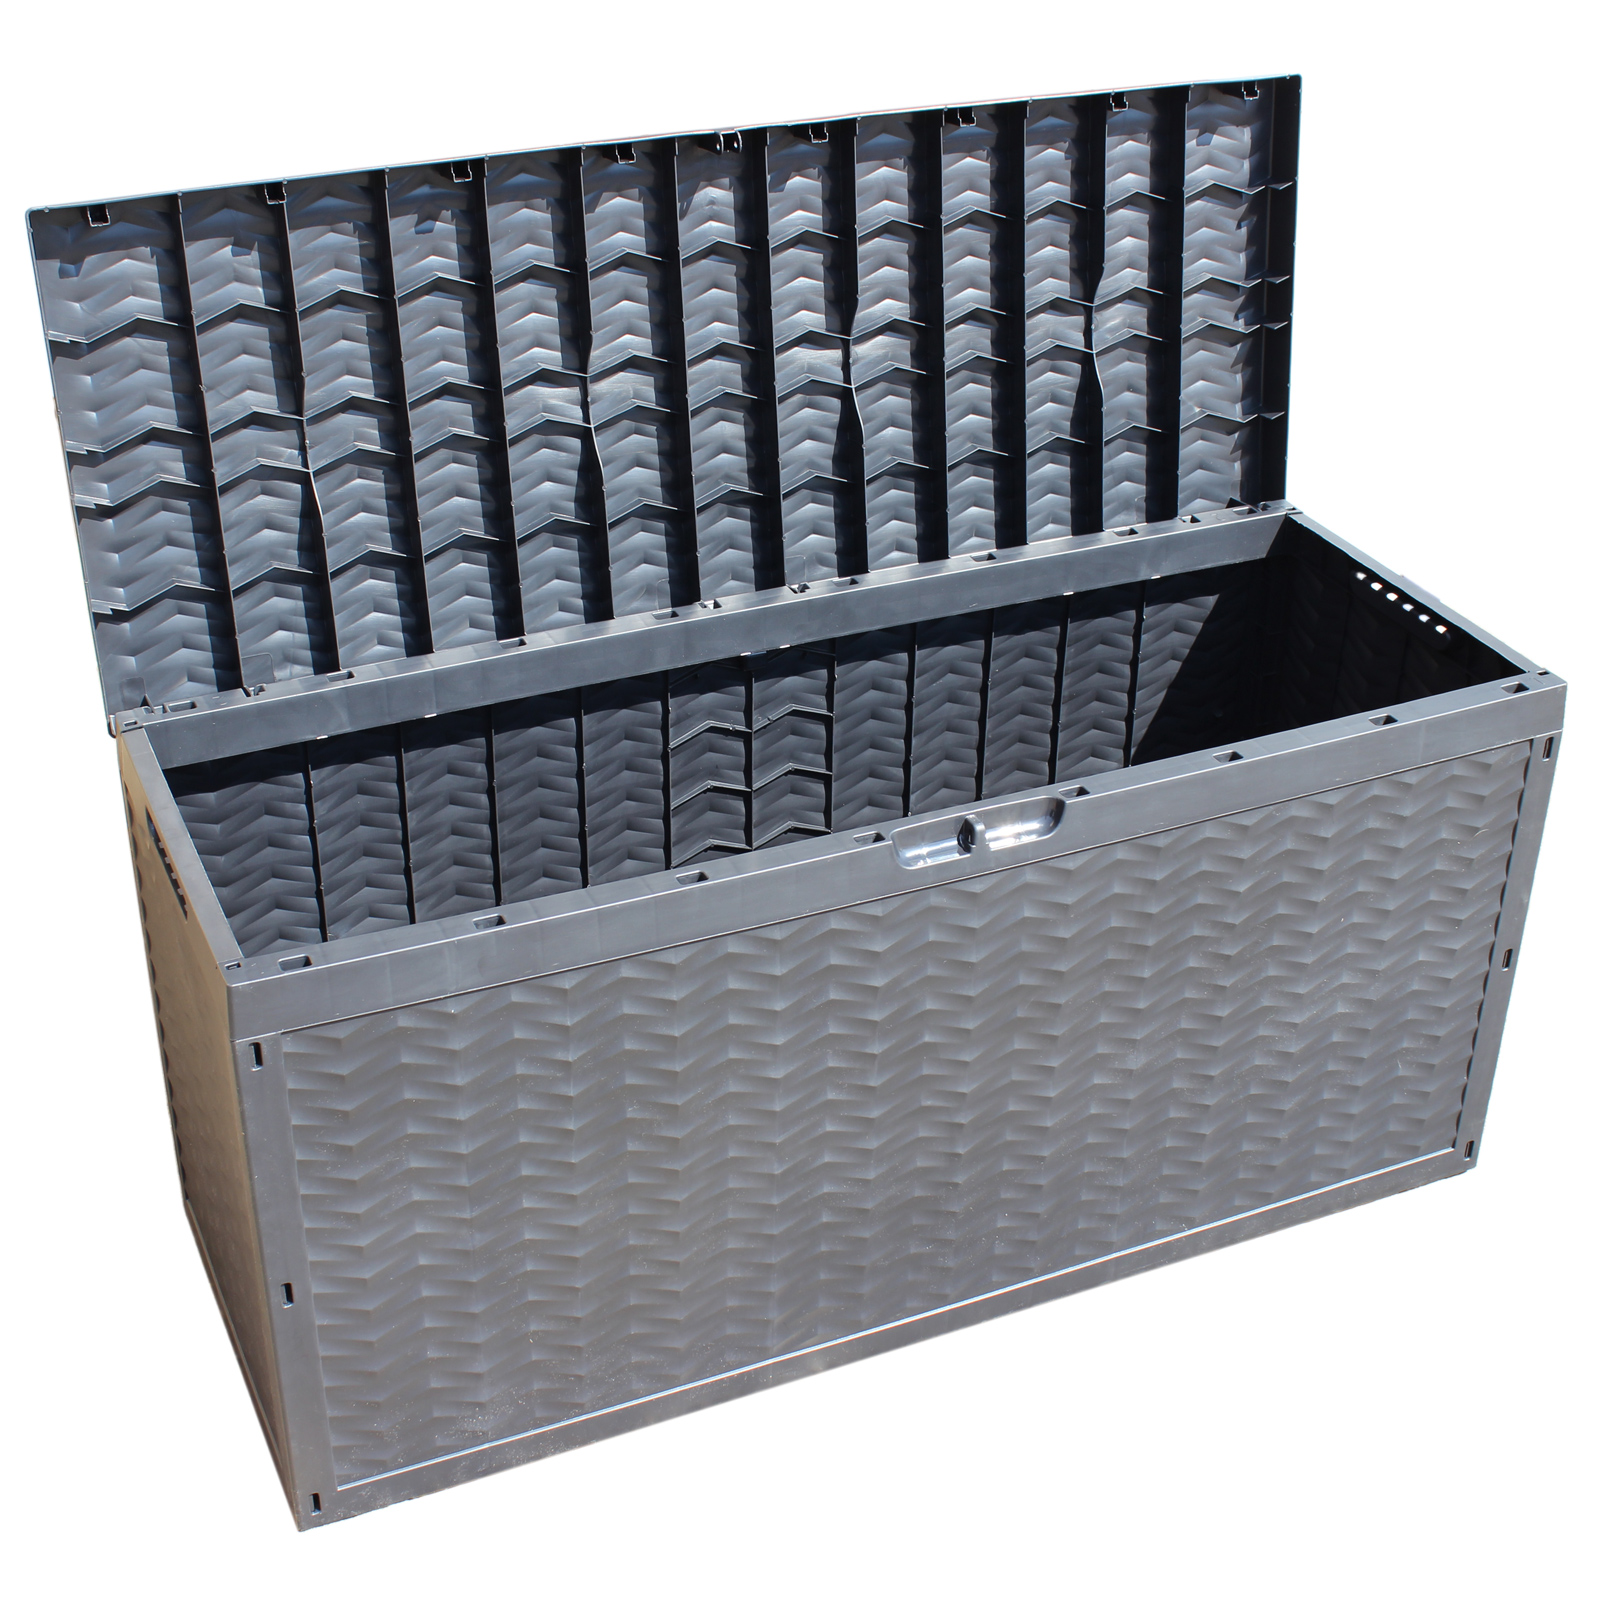 Storage outdoor box garden patio chest plastic lid for Balcony storage